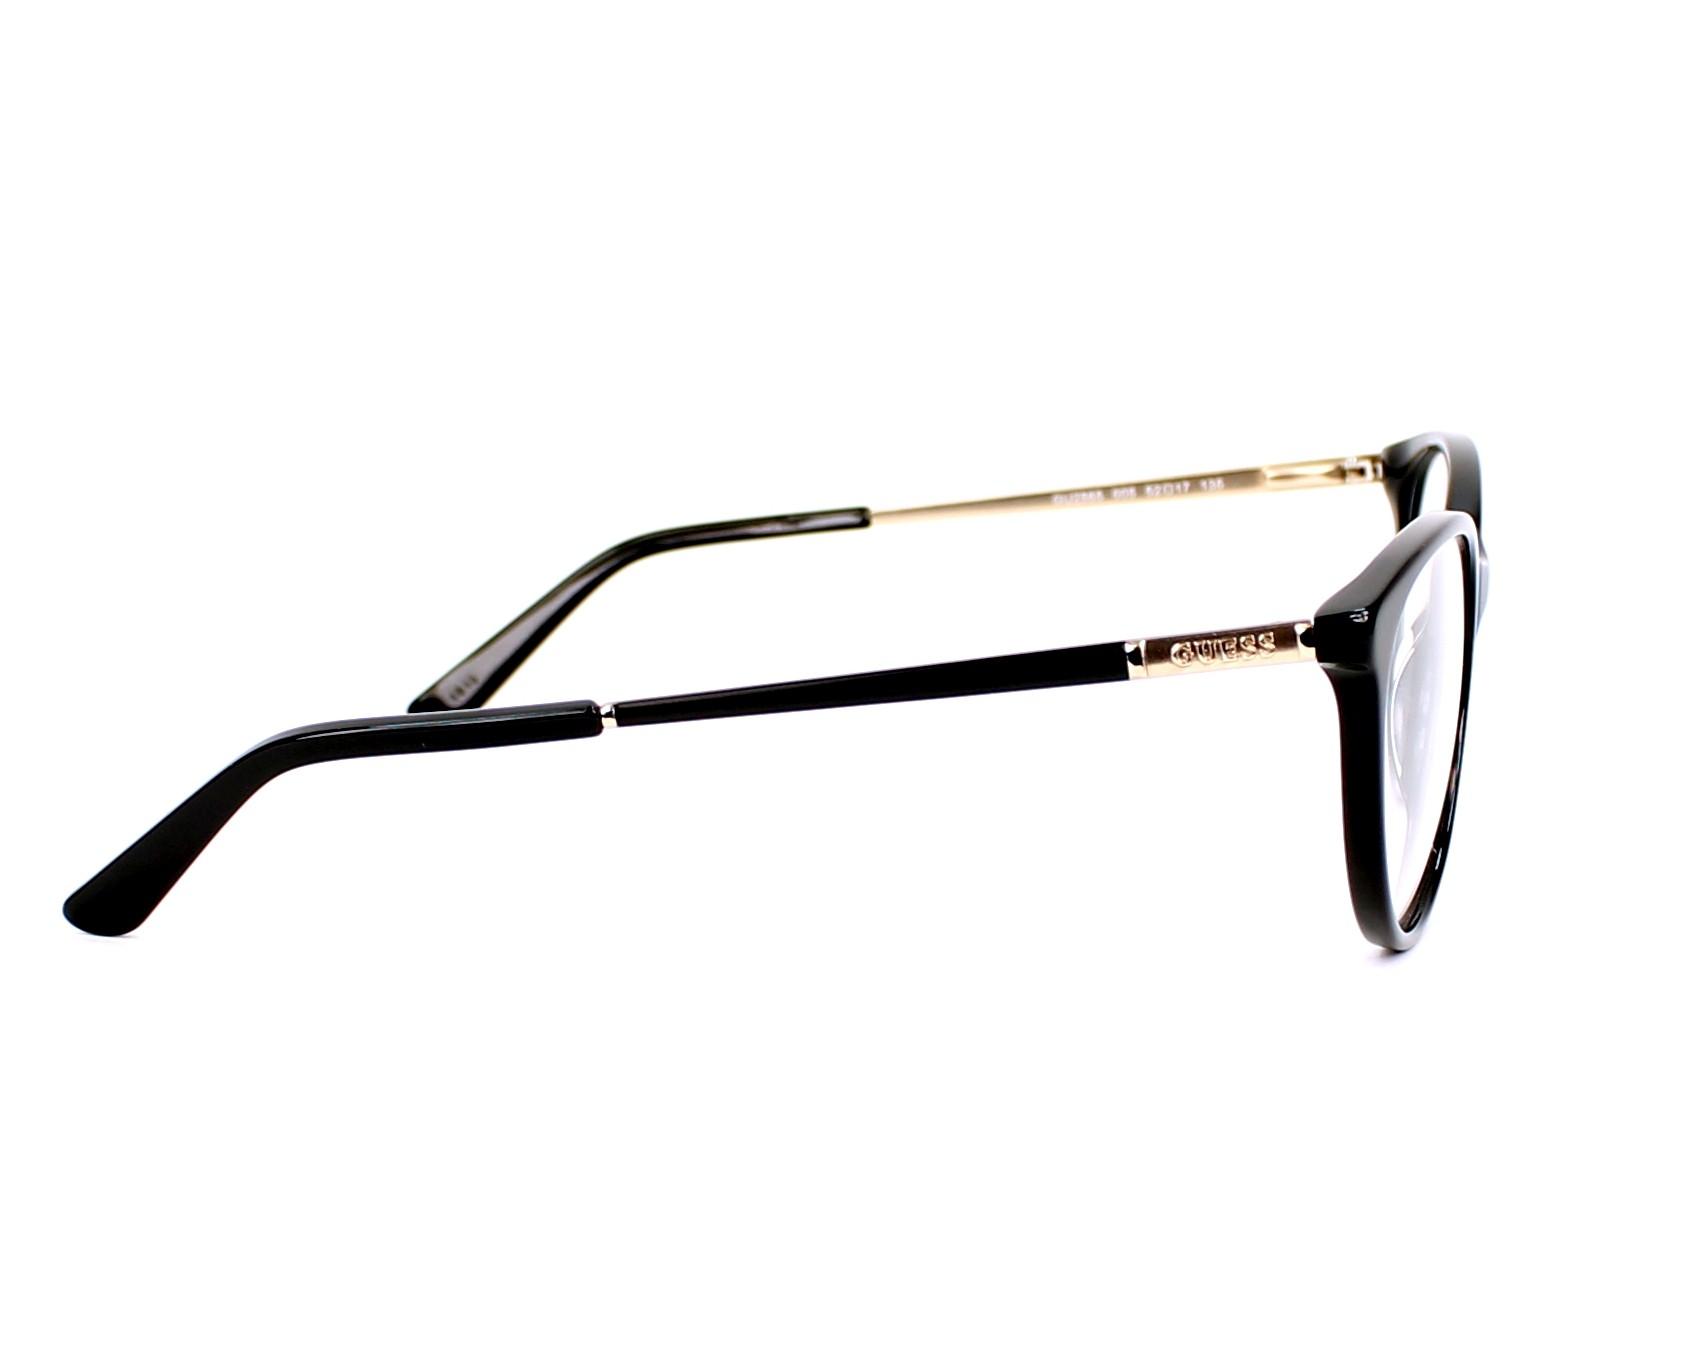 7633412e865 eyeglasses Guess GU-2565 005 52-17 Black Gold Copper side view